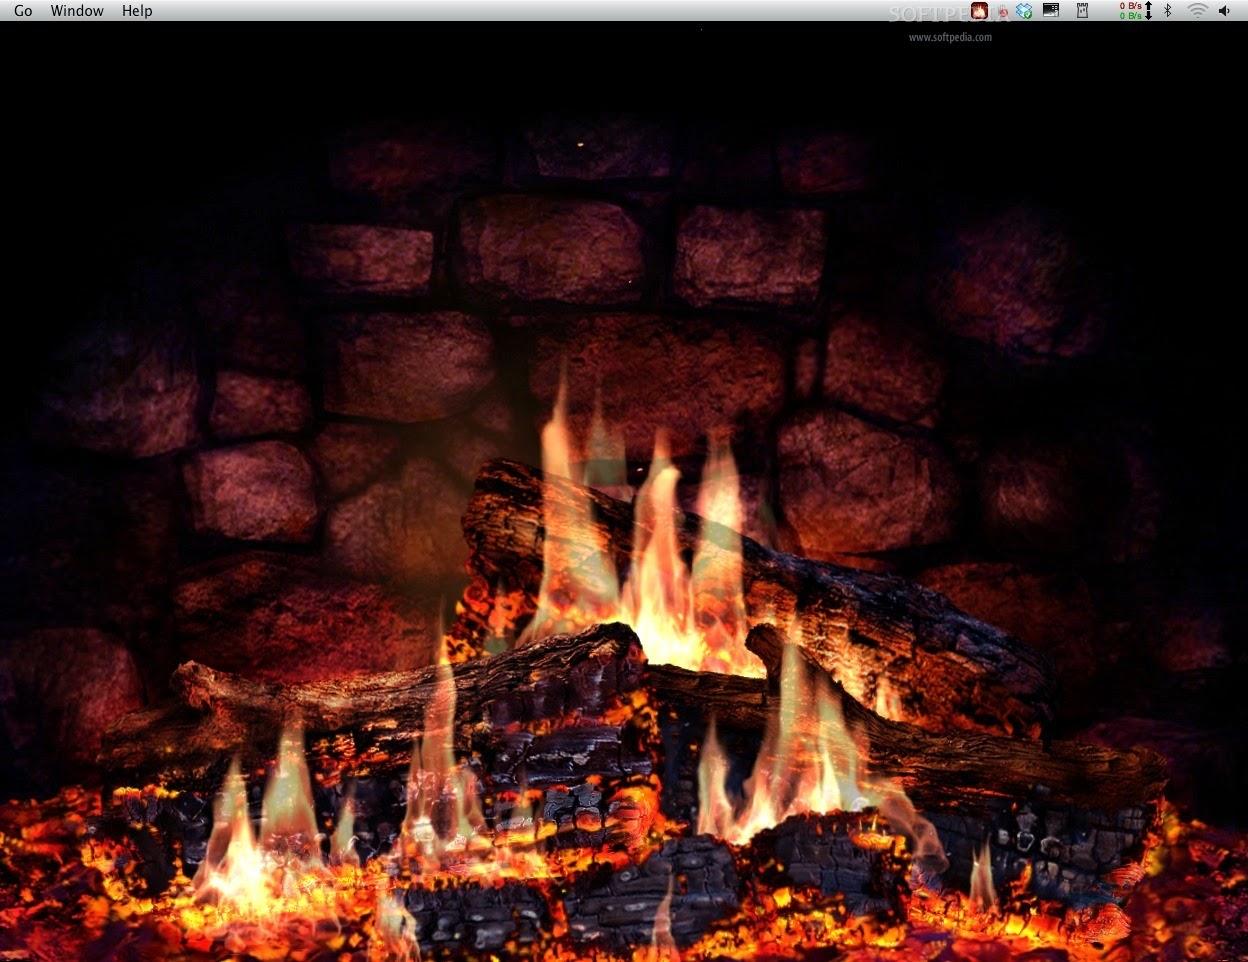 Animated Fish Tank Wallpaper Animated Fireplace Wallpaper Wallpaper Animated